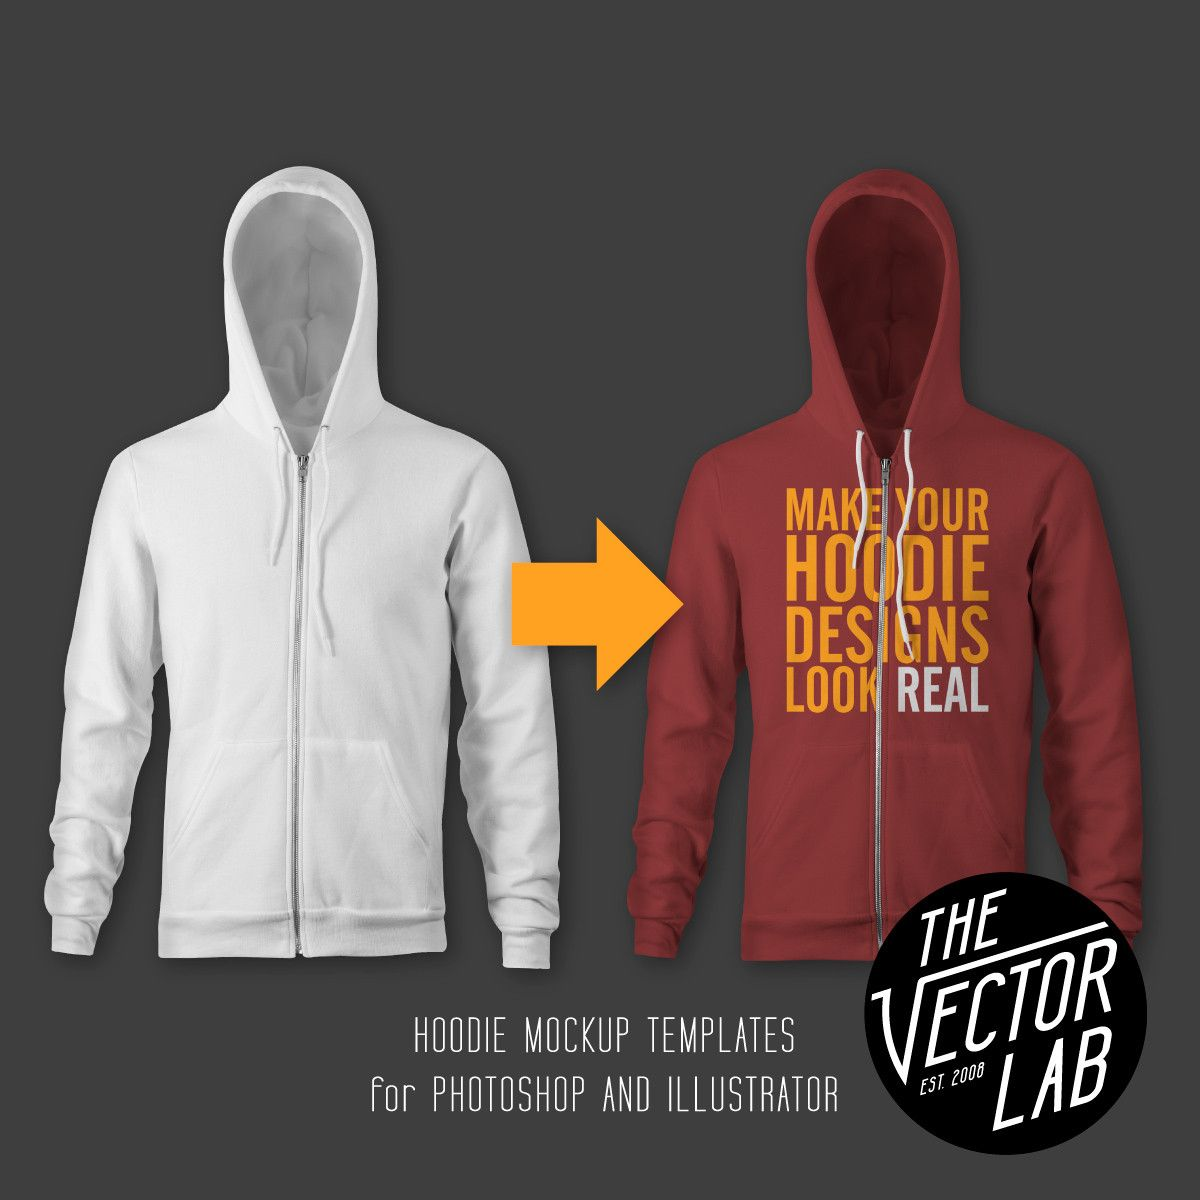 Download Men S Hoodie Mockup Templates For Adobe Clothing Mockup Hoodie Mockup Mockup Templates